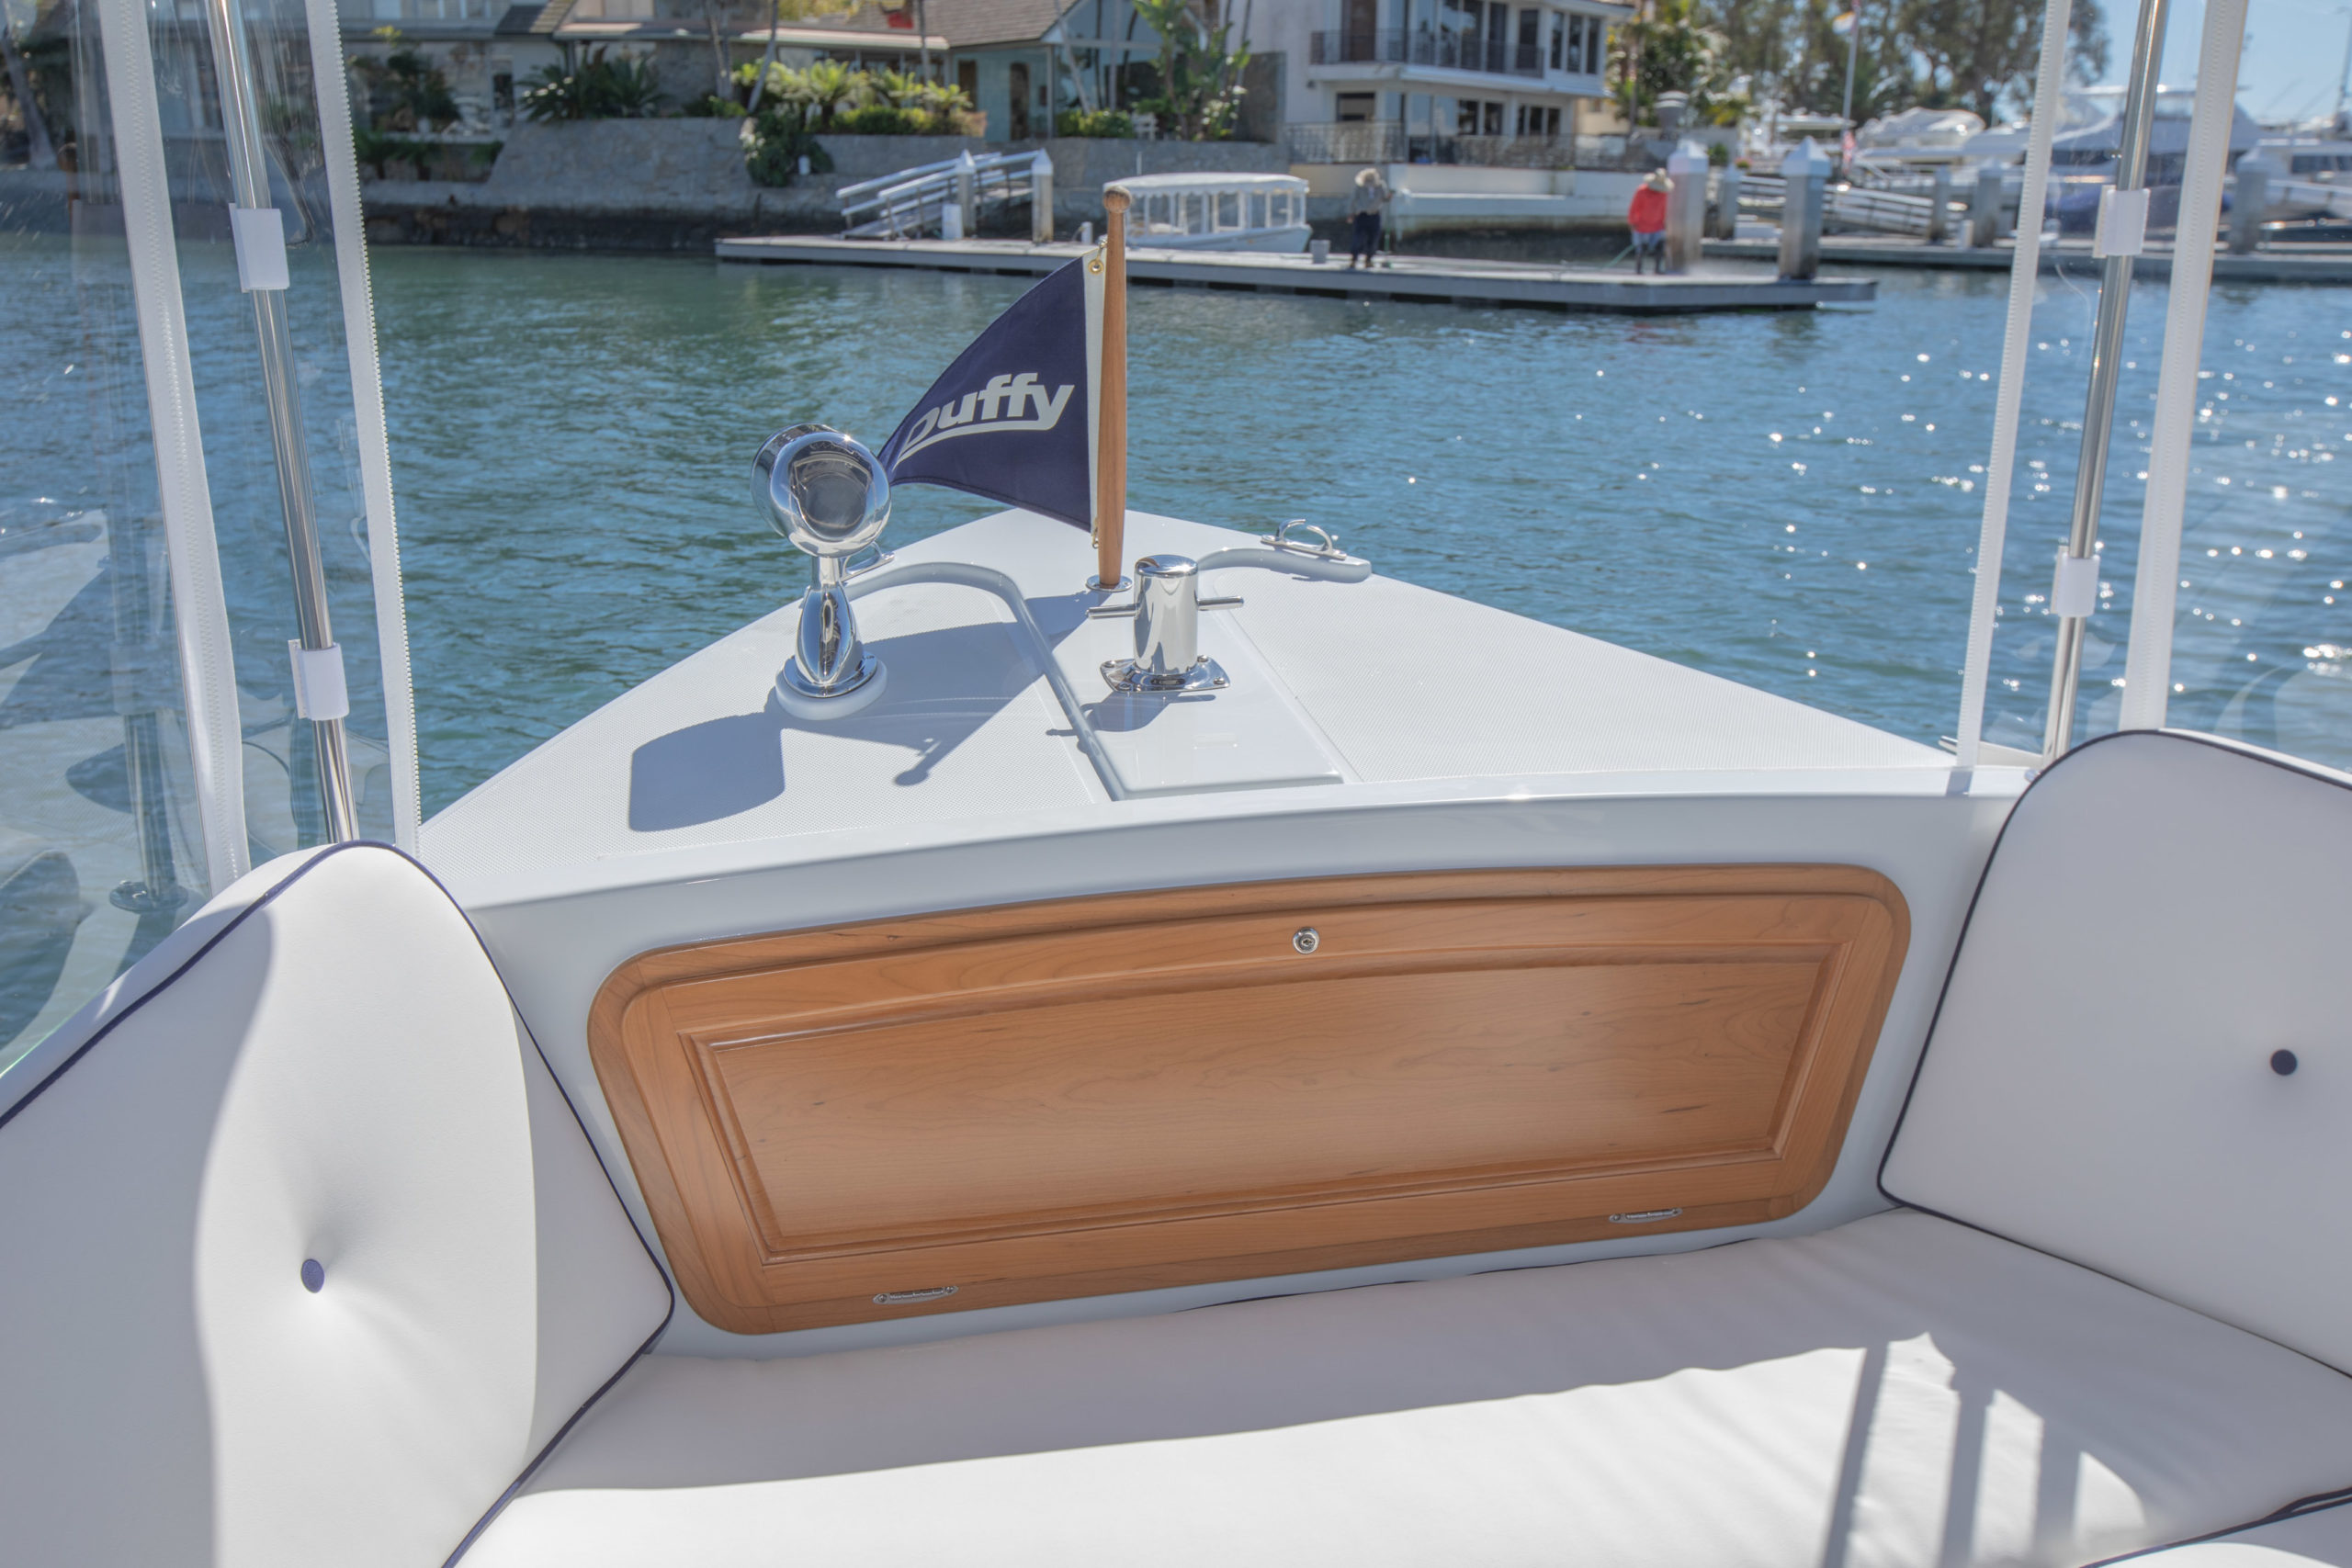 Duffy-Electric-Boats-22-Sun-Cruiser-Interior-2020-17